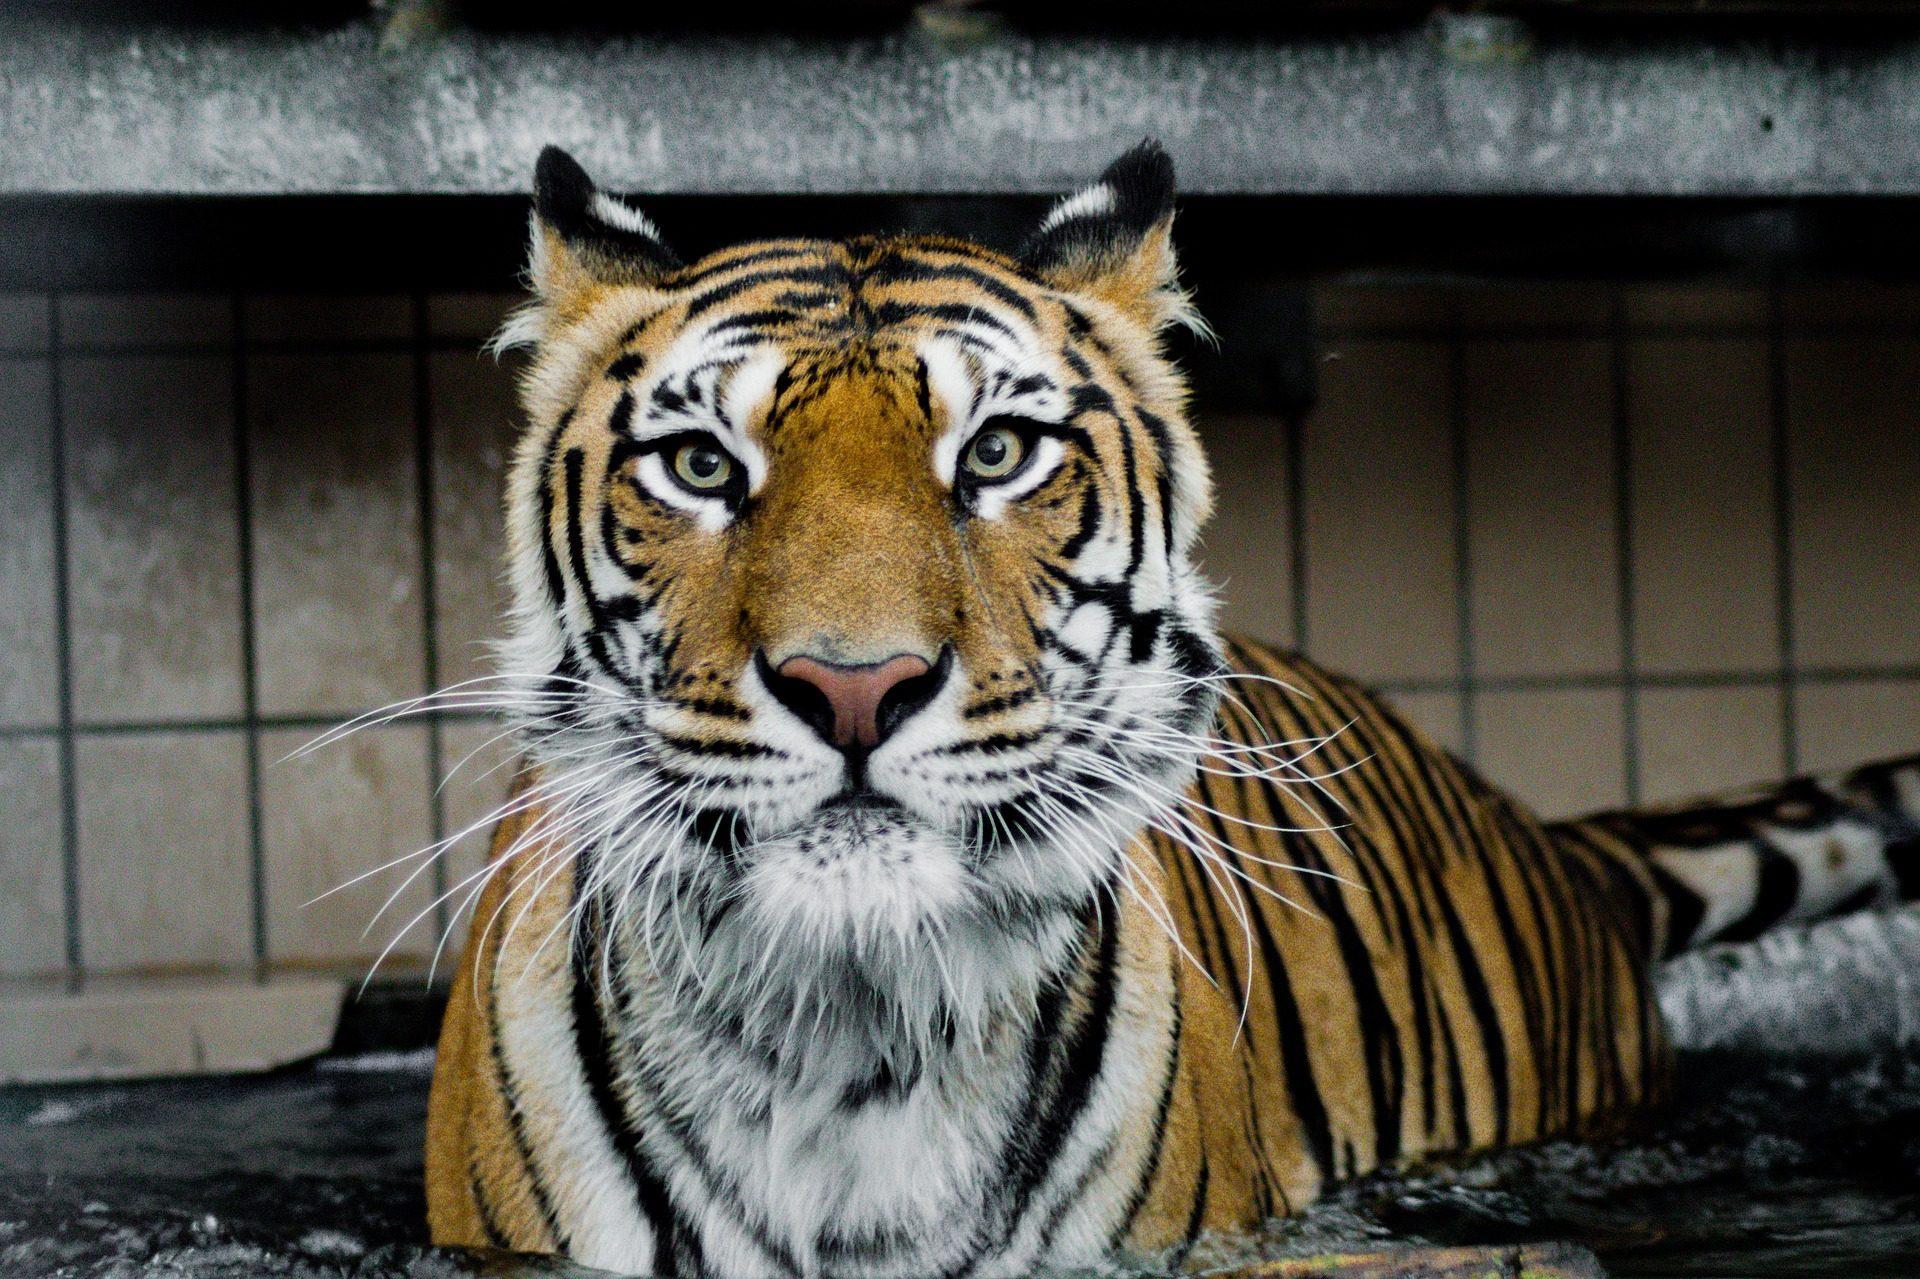 Tiger, Sibirische, Streifen, pelajo, Blick, Katze, Predator - Wallpaper HD - Prof.-falken.com